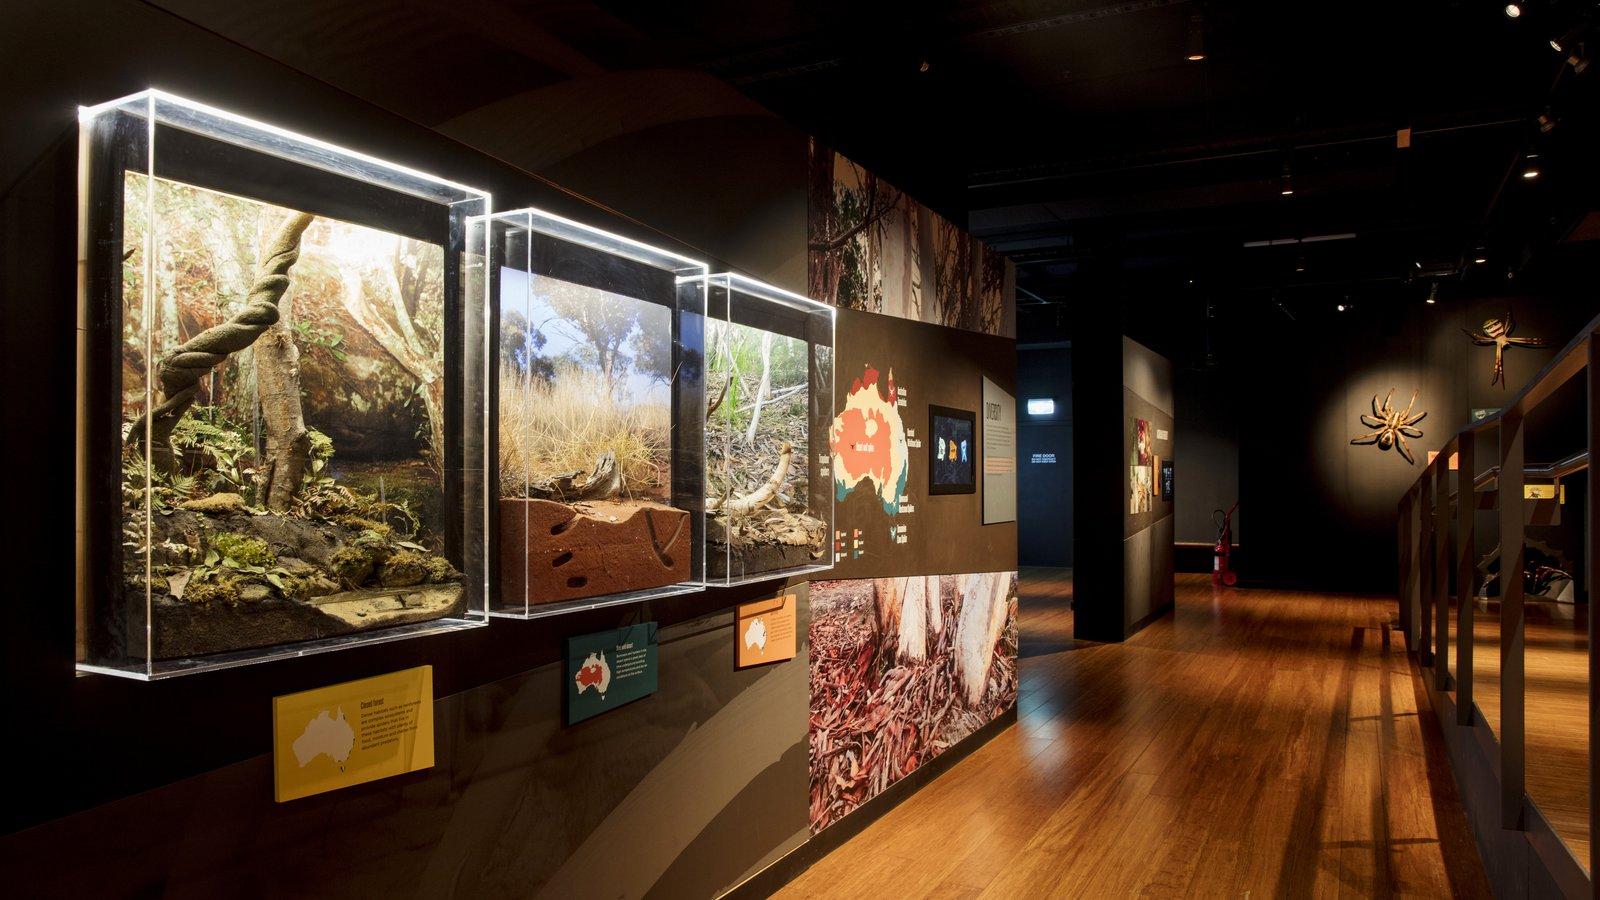 Spiders exhibition showcases